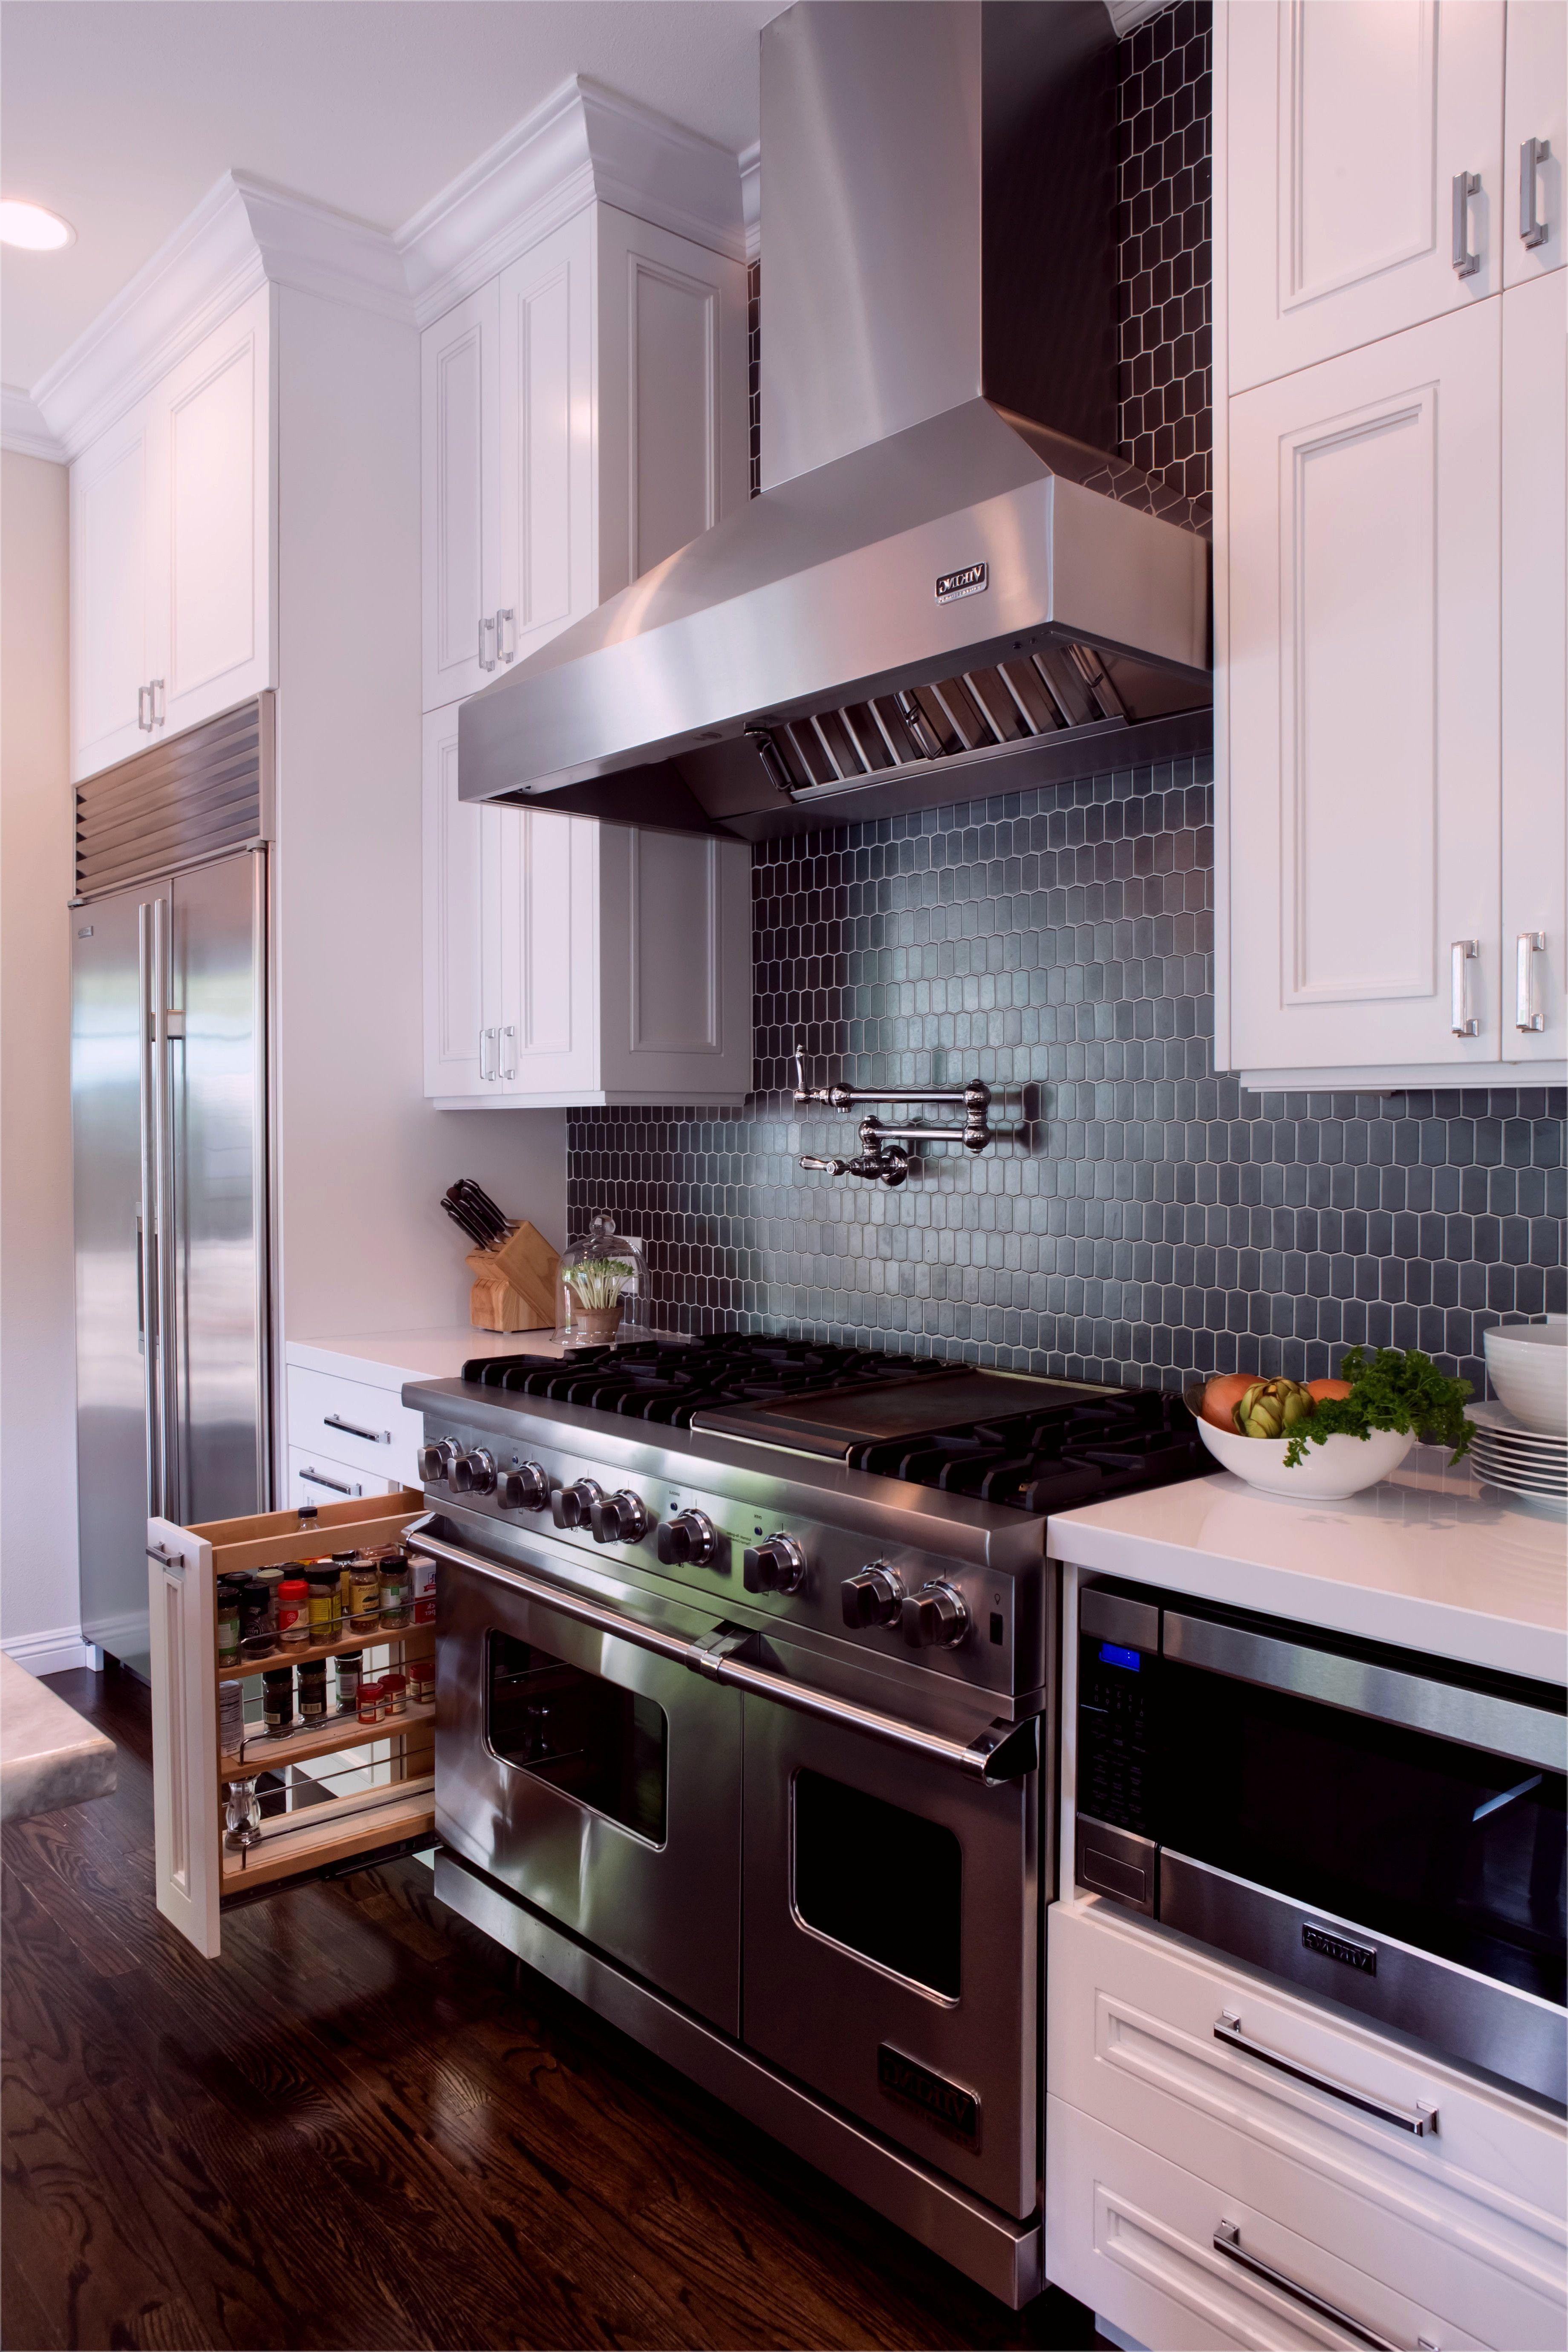 Buy Kitchen Island Kitchen Design Kansas City Kitchen Ideas With